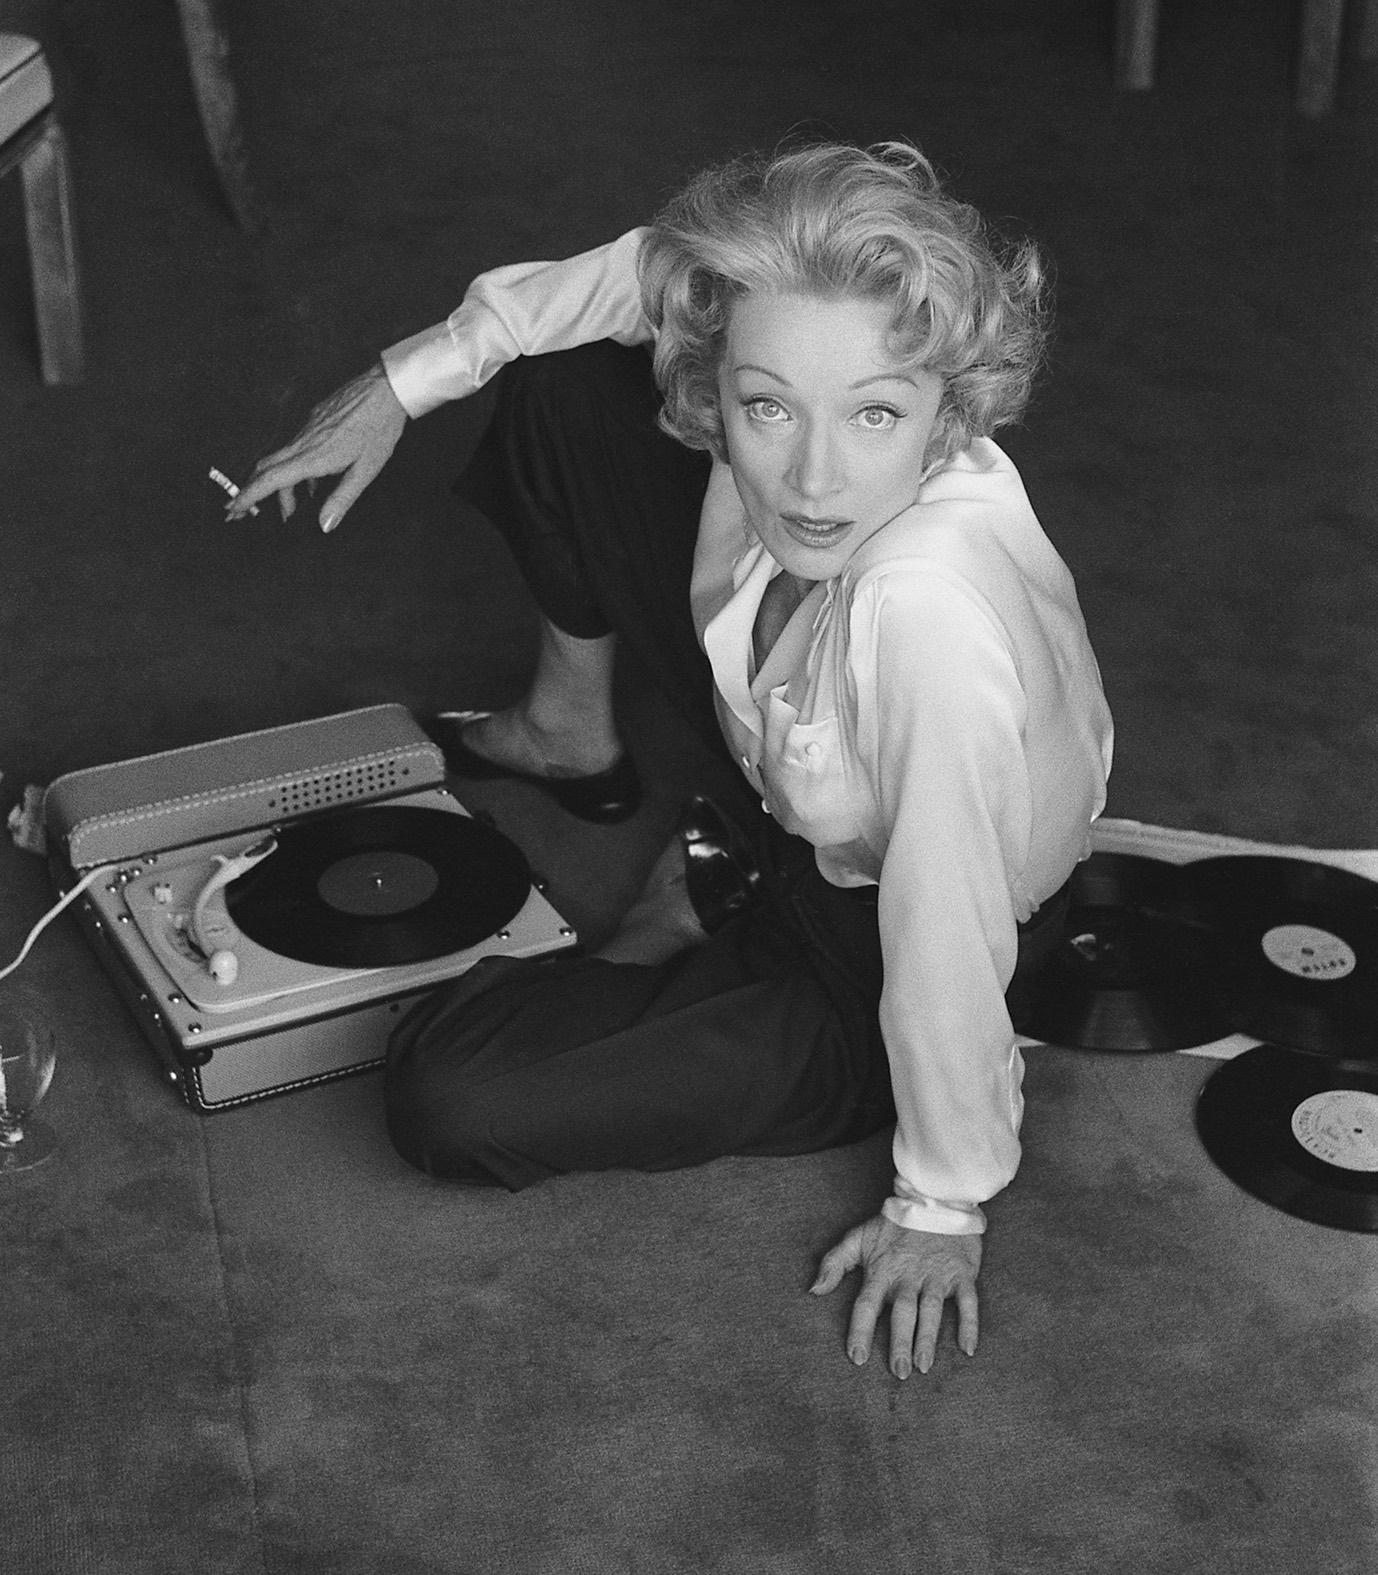 Marlène Dietrich with Record Player, L'hotel de Paris, Monte Carlo, 1956